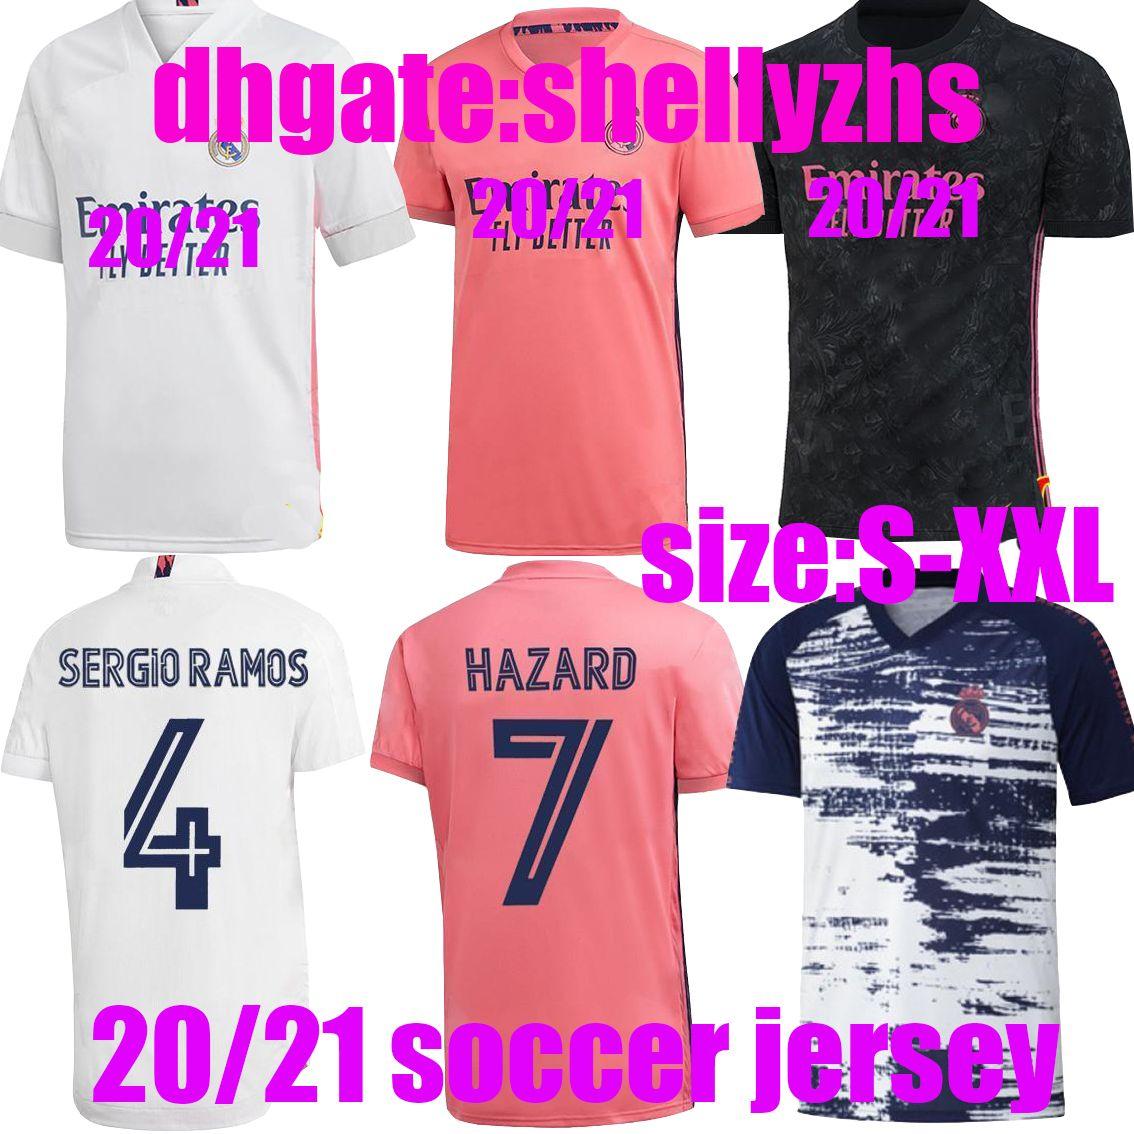 2020 Best Quality 2020 2021 Real Madrid Jerseys 20 21 Man Soccer Jersey Hazard Sergio Ramos Benzema Vinicius Camiseta Football Shirt From Shellyzhs 14 32 Dhgate Com